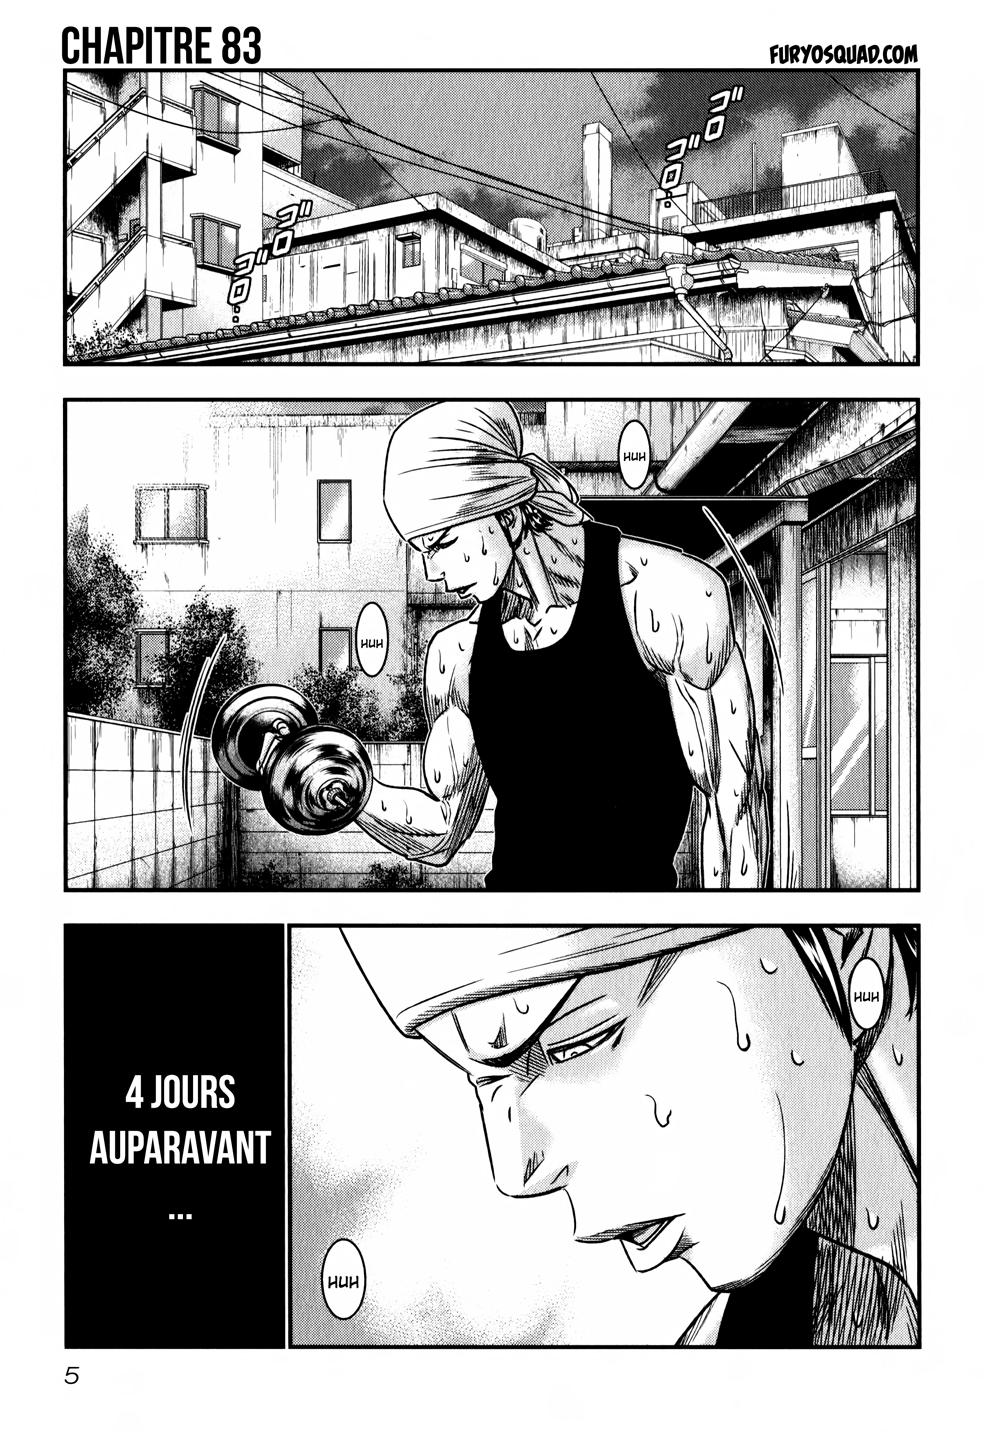 https://nine.mangadogs.com/fr_manga/pic2/5/837/188134/Out83VF_0_633.jpg Page 1